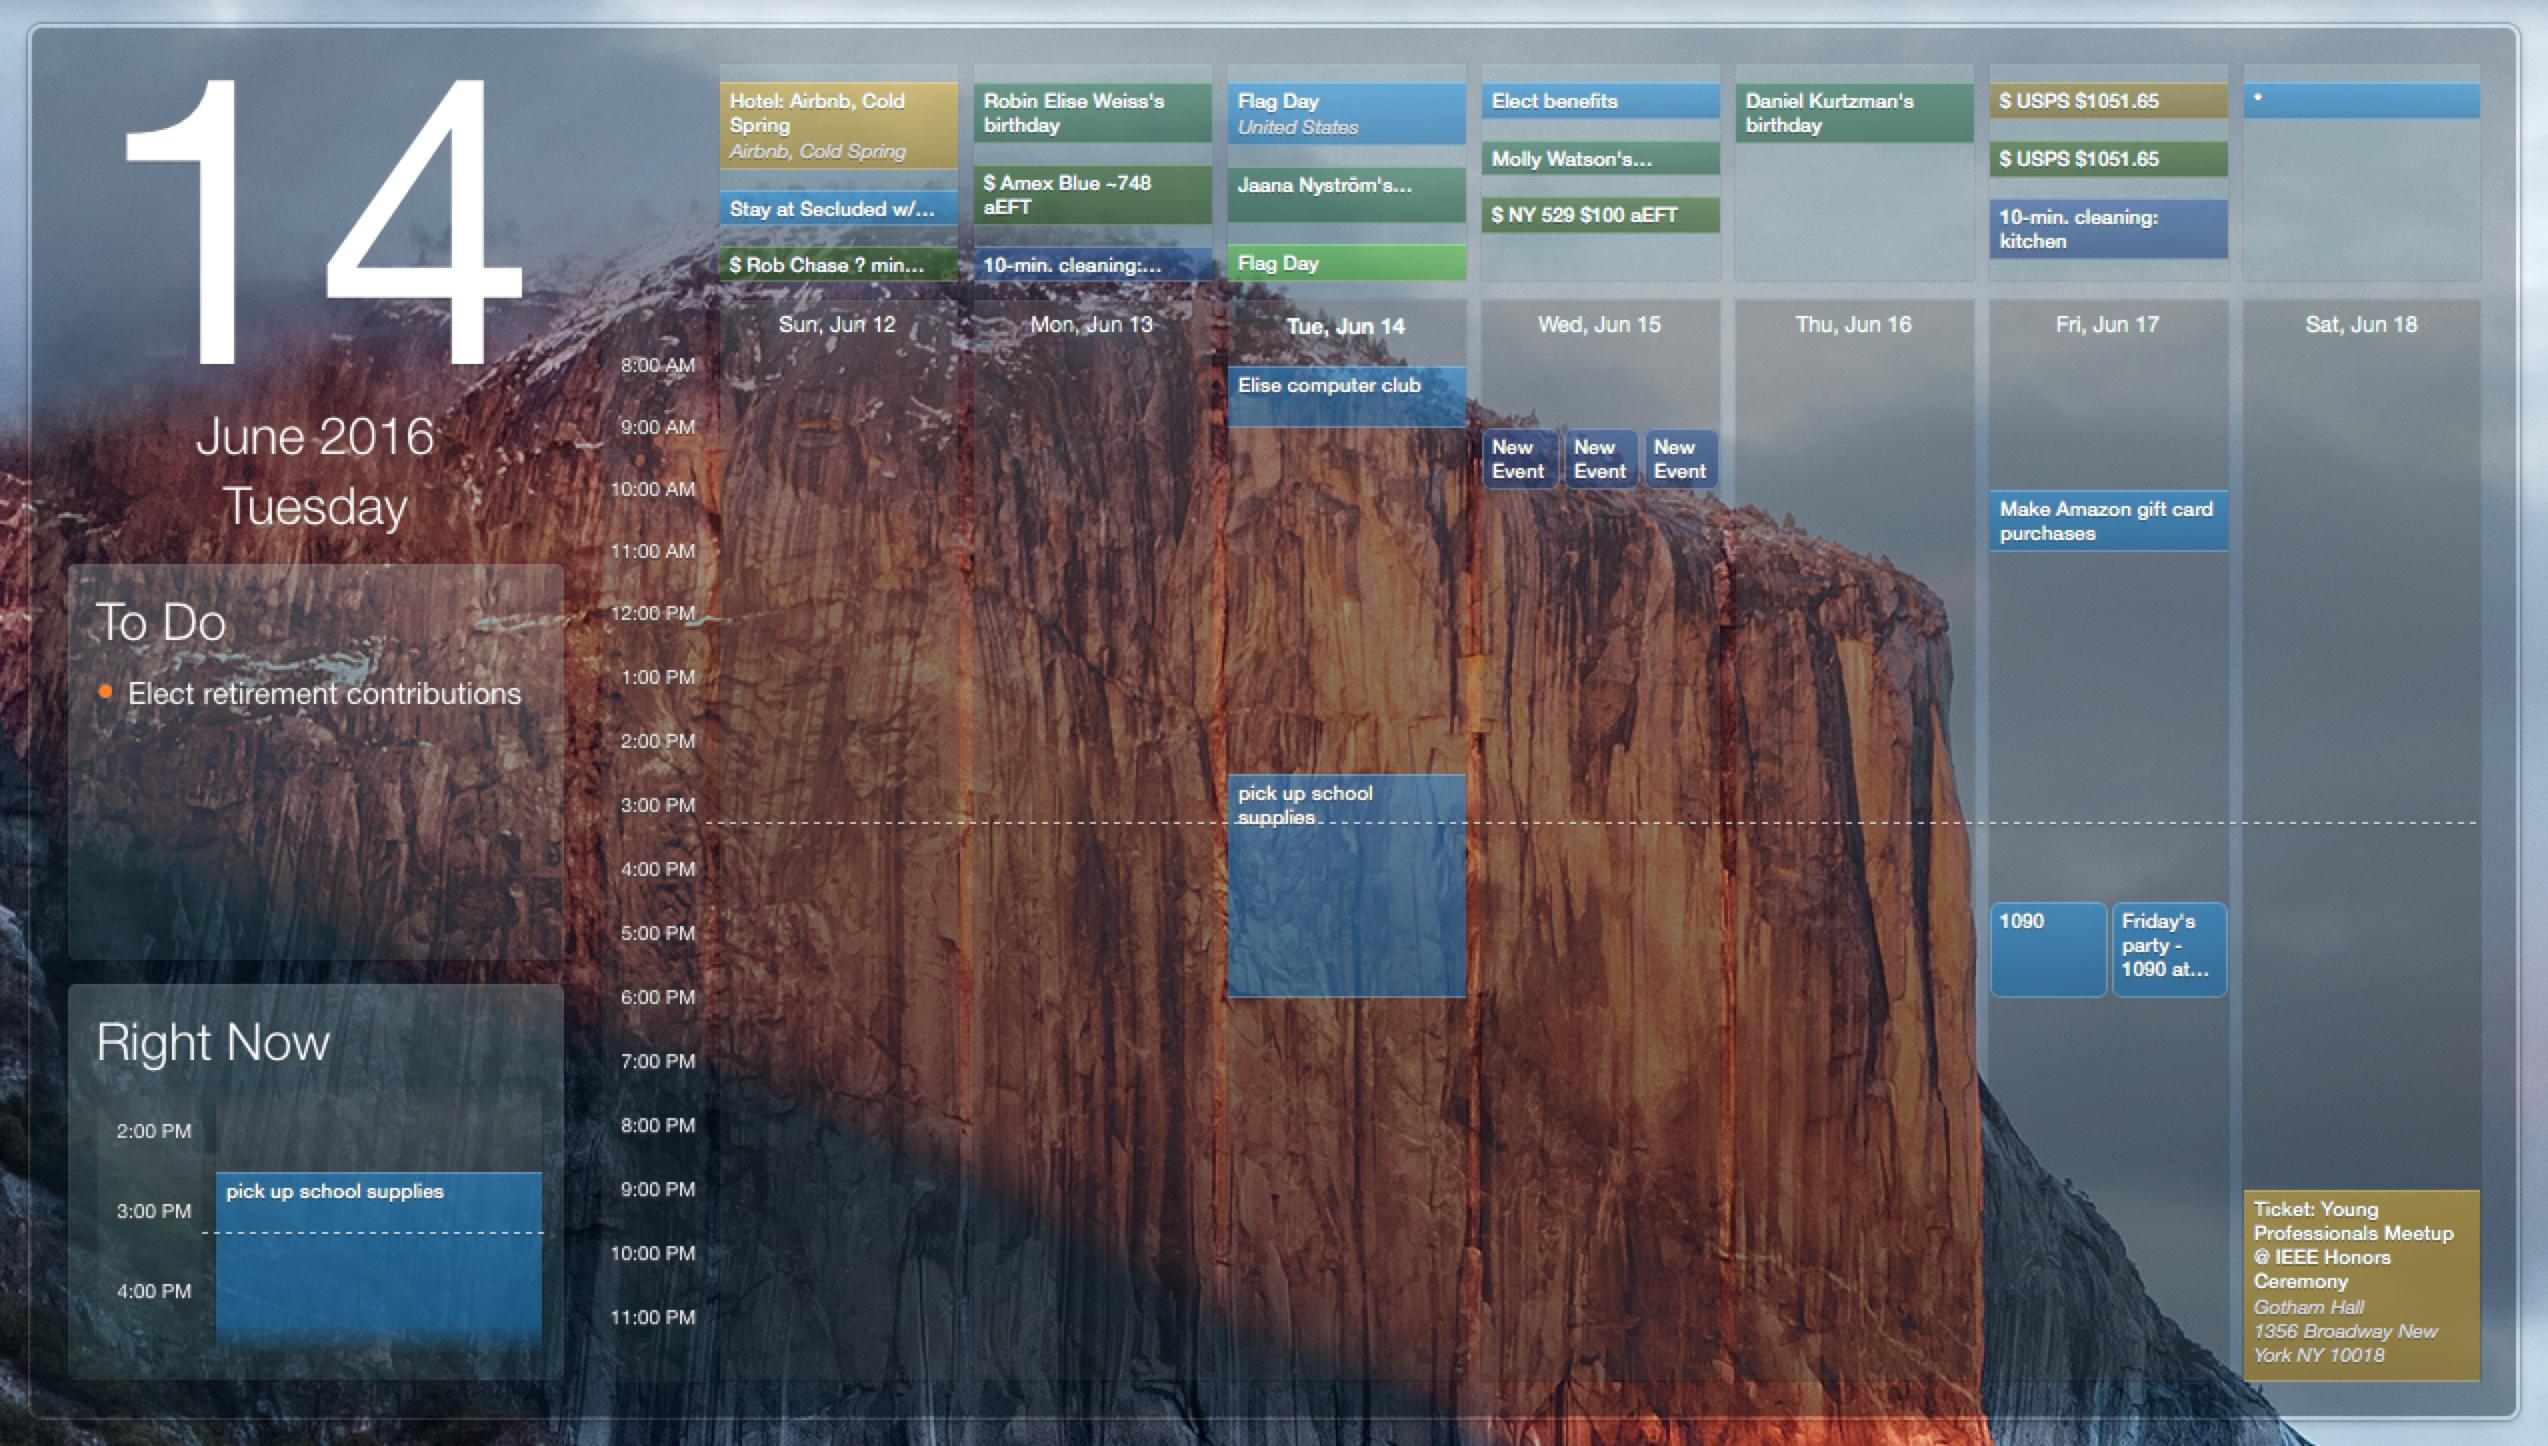 Download Google Calendar App For Mac - Ubercrack's Blog